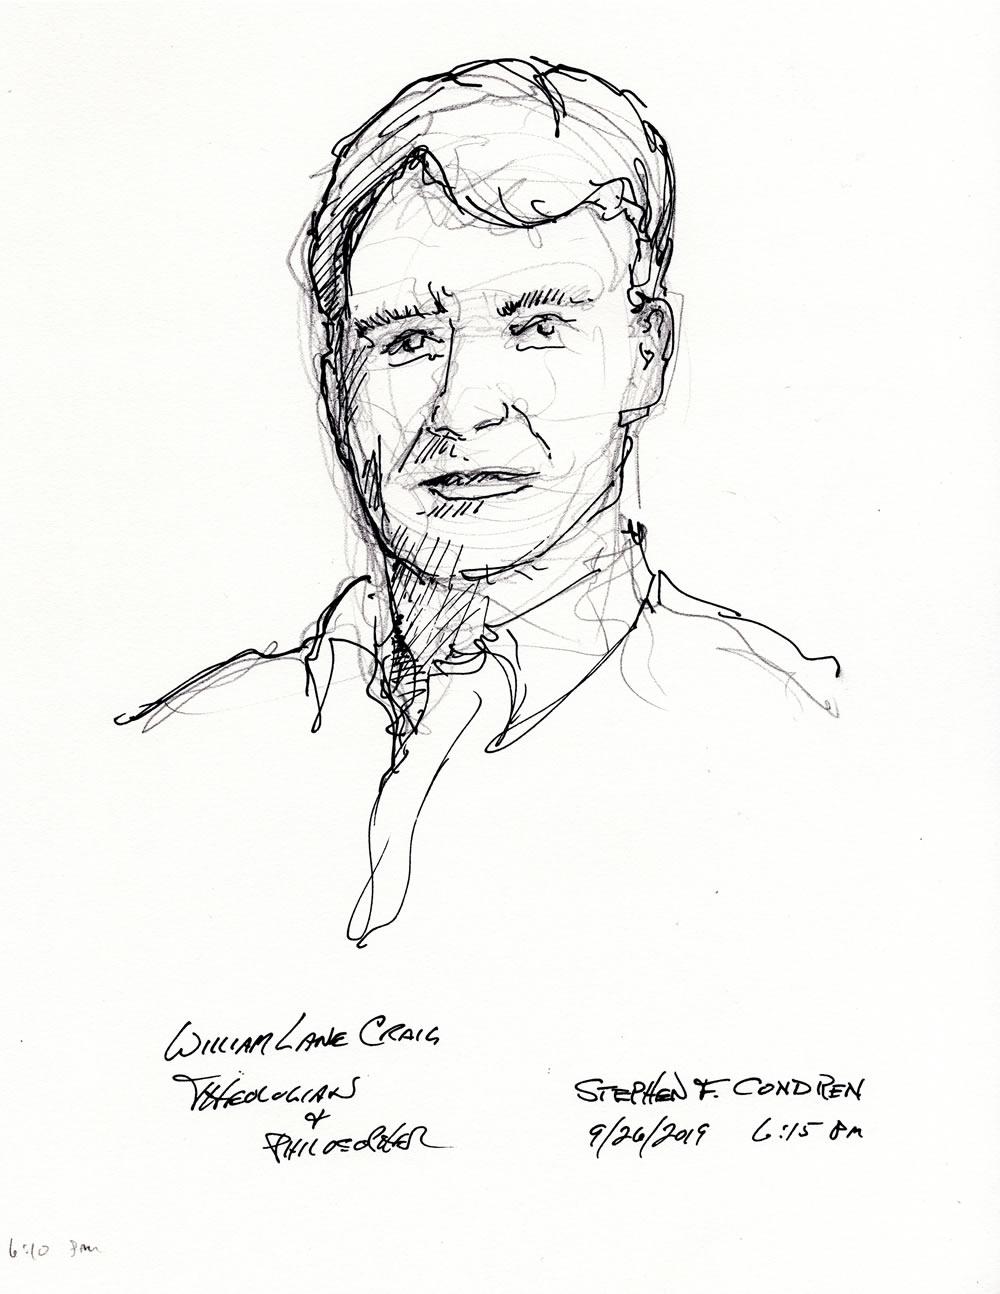 William Lane Craig #405Z pen & ink drawing by artist Stephen F. Condren.